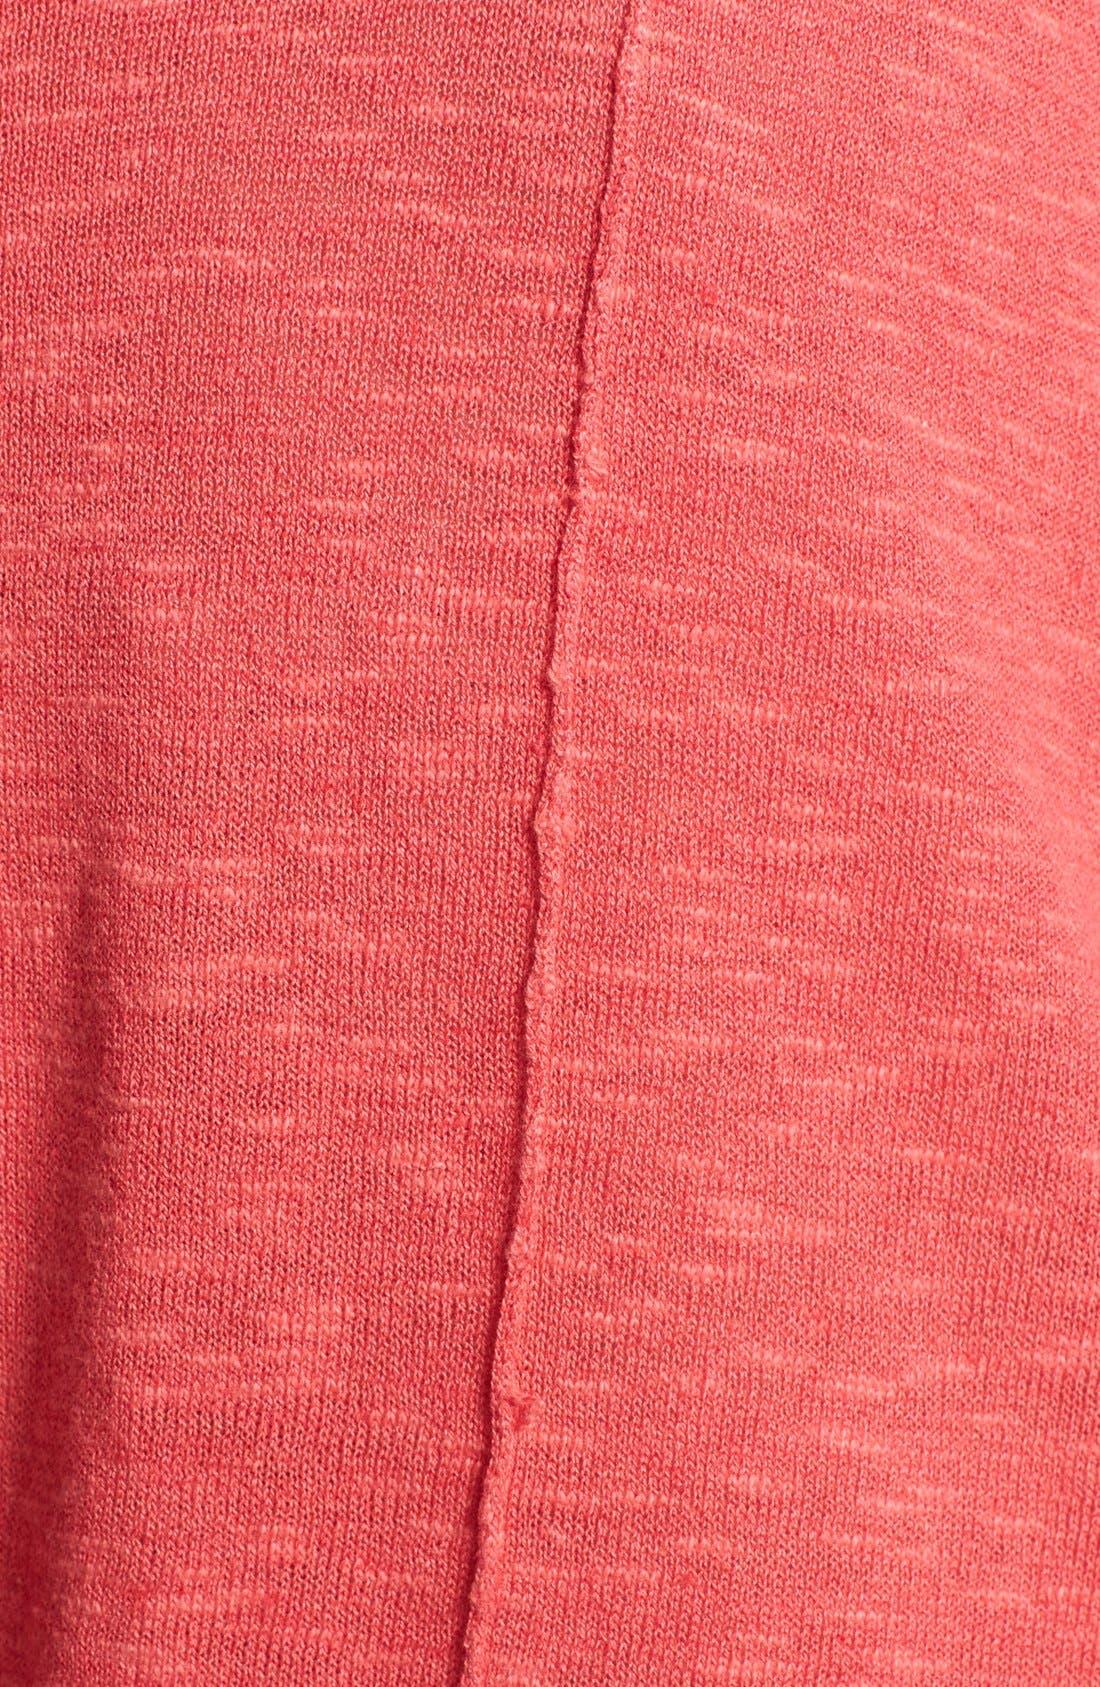 Cap Sleeve Organic Linen & Cotton Scoop Neck Top,                             Alternate thumbnail 34, color,